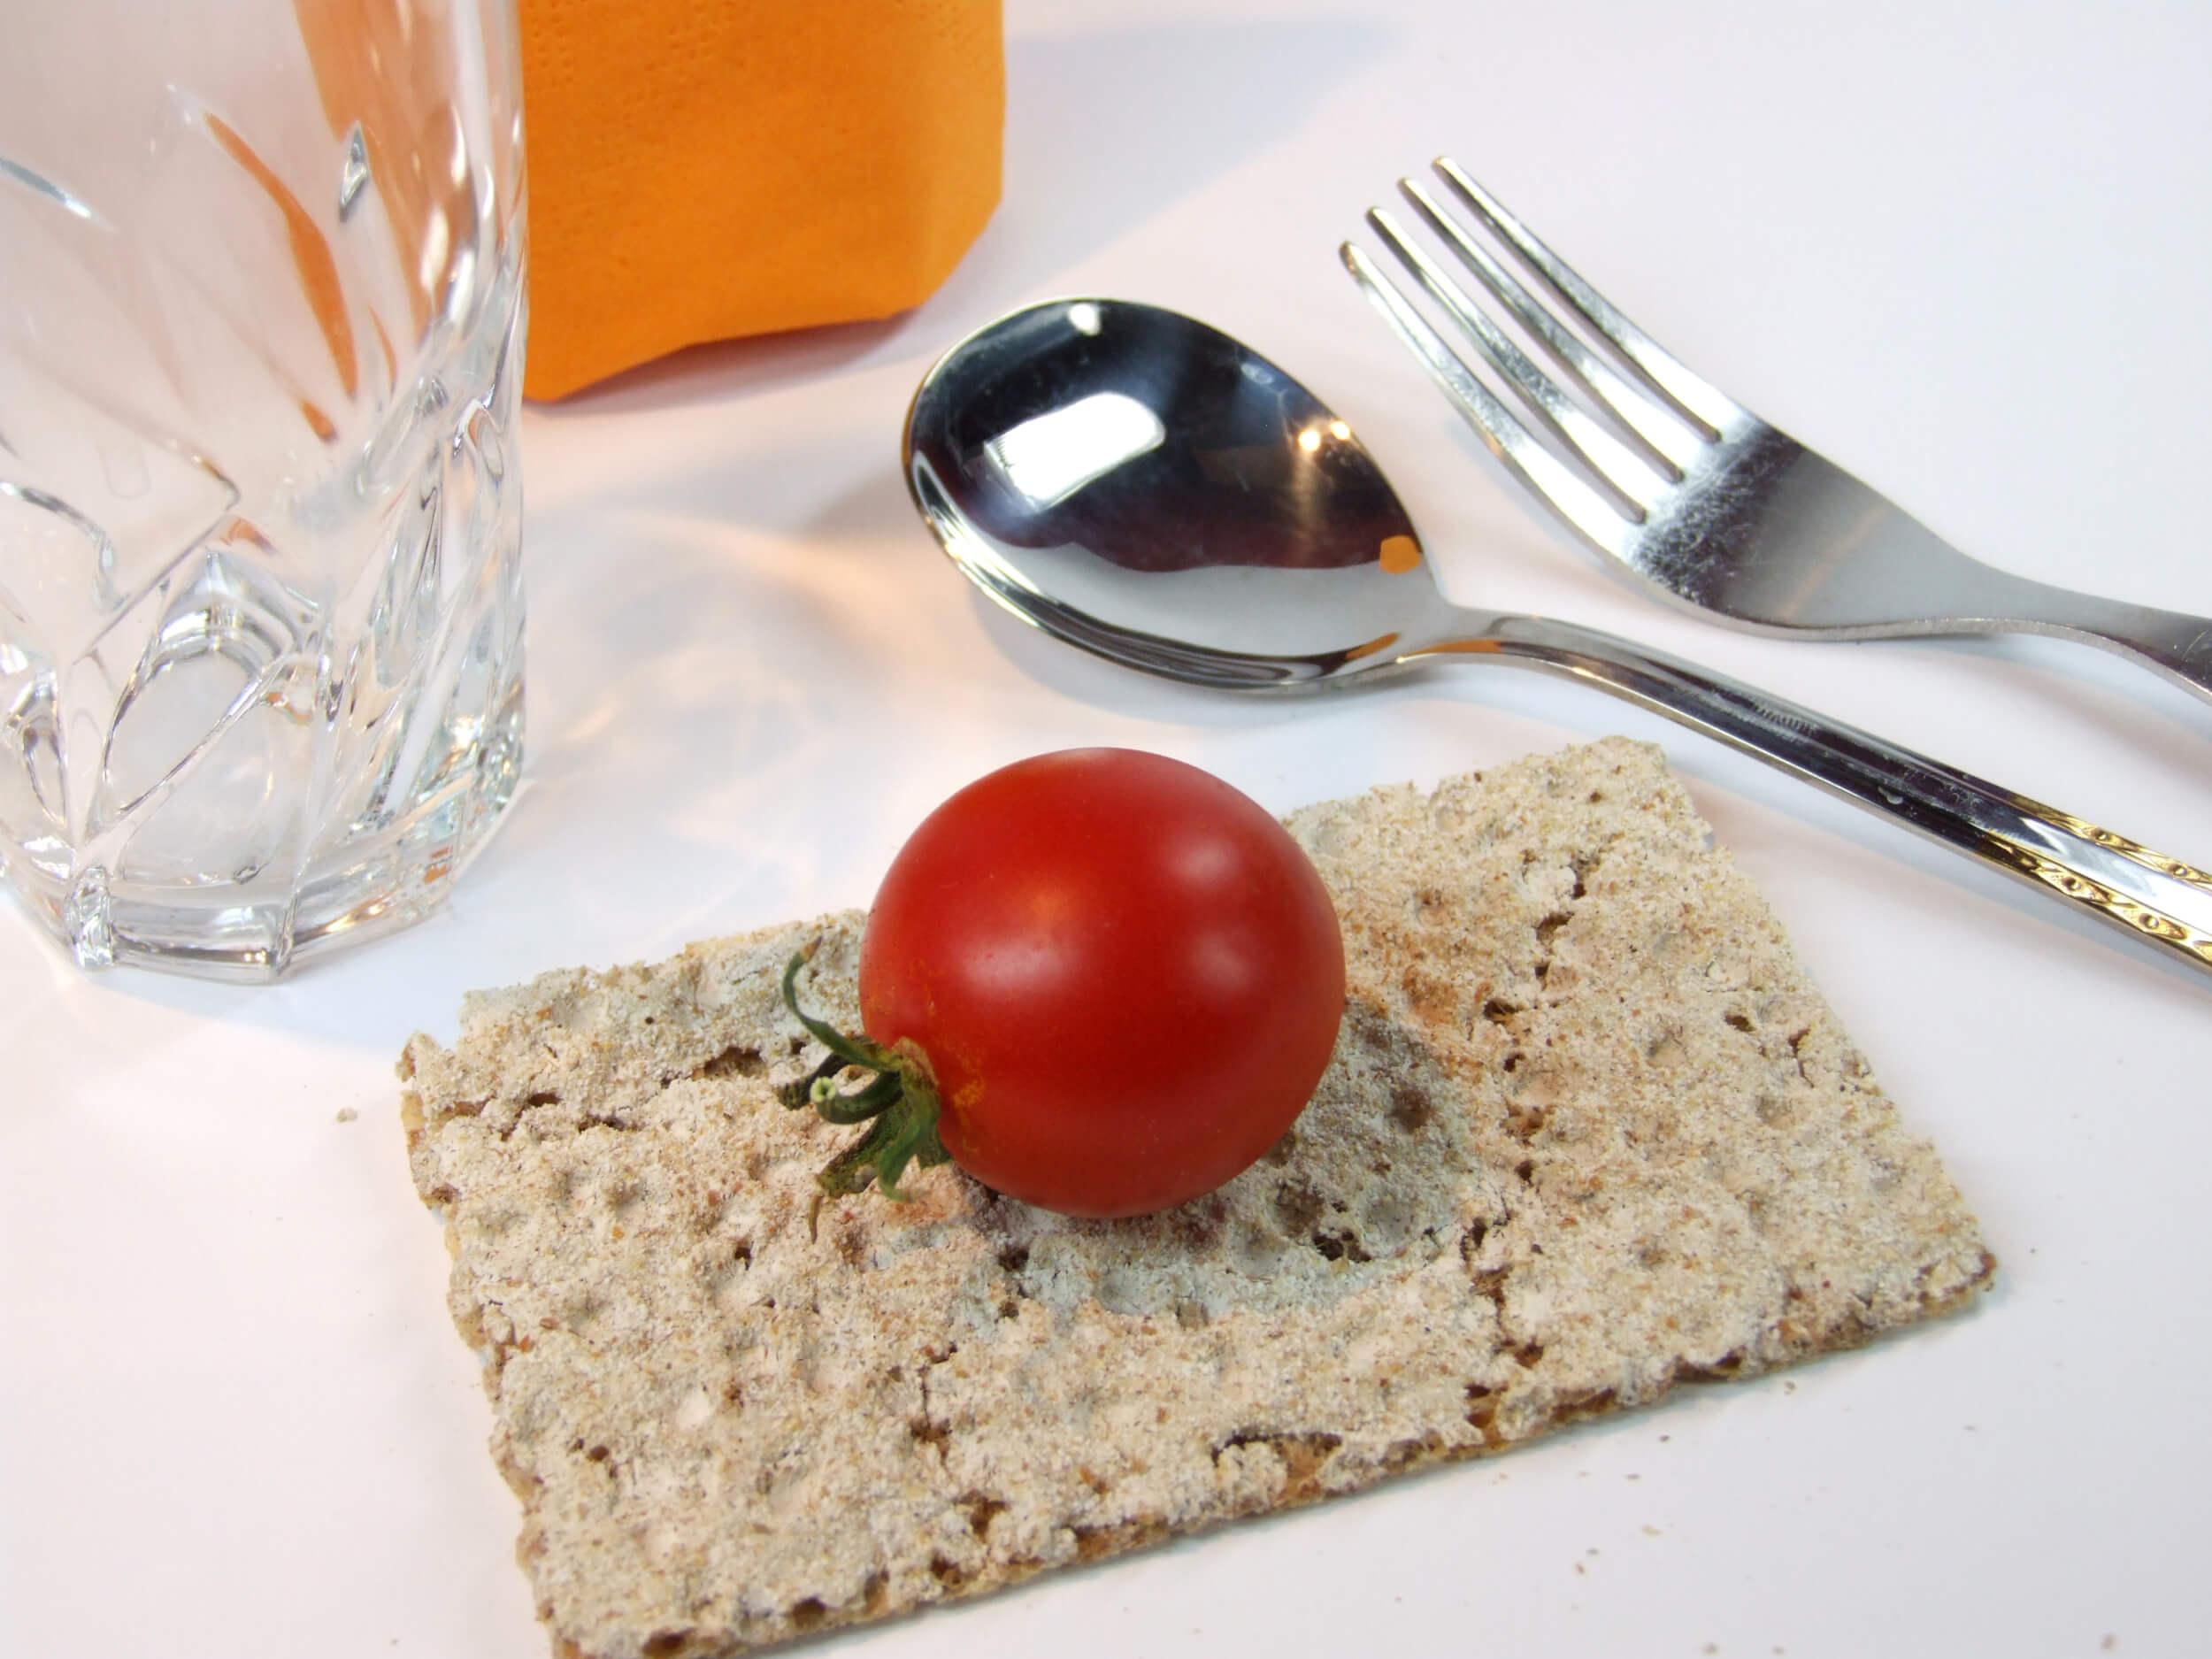 Ernährung | diät - Knäckebrot mit Tomate (c) U. Herbert / pixelio.de